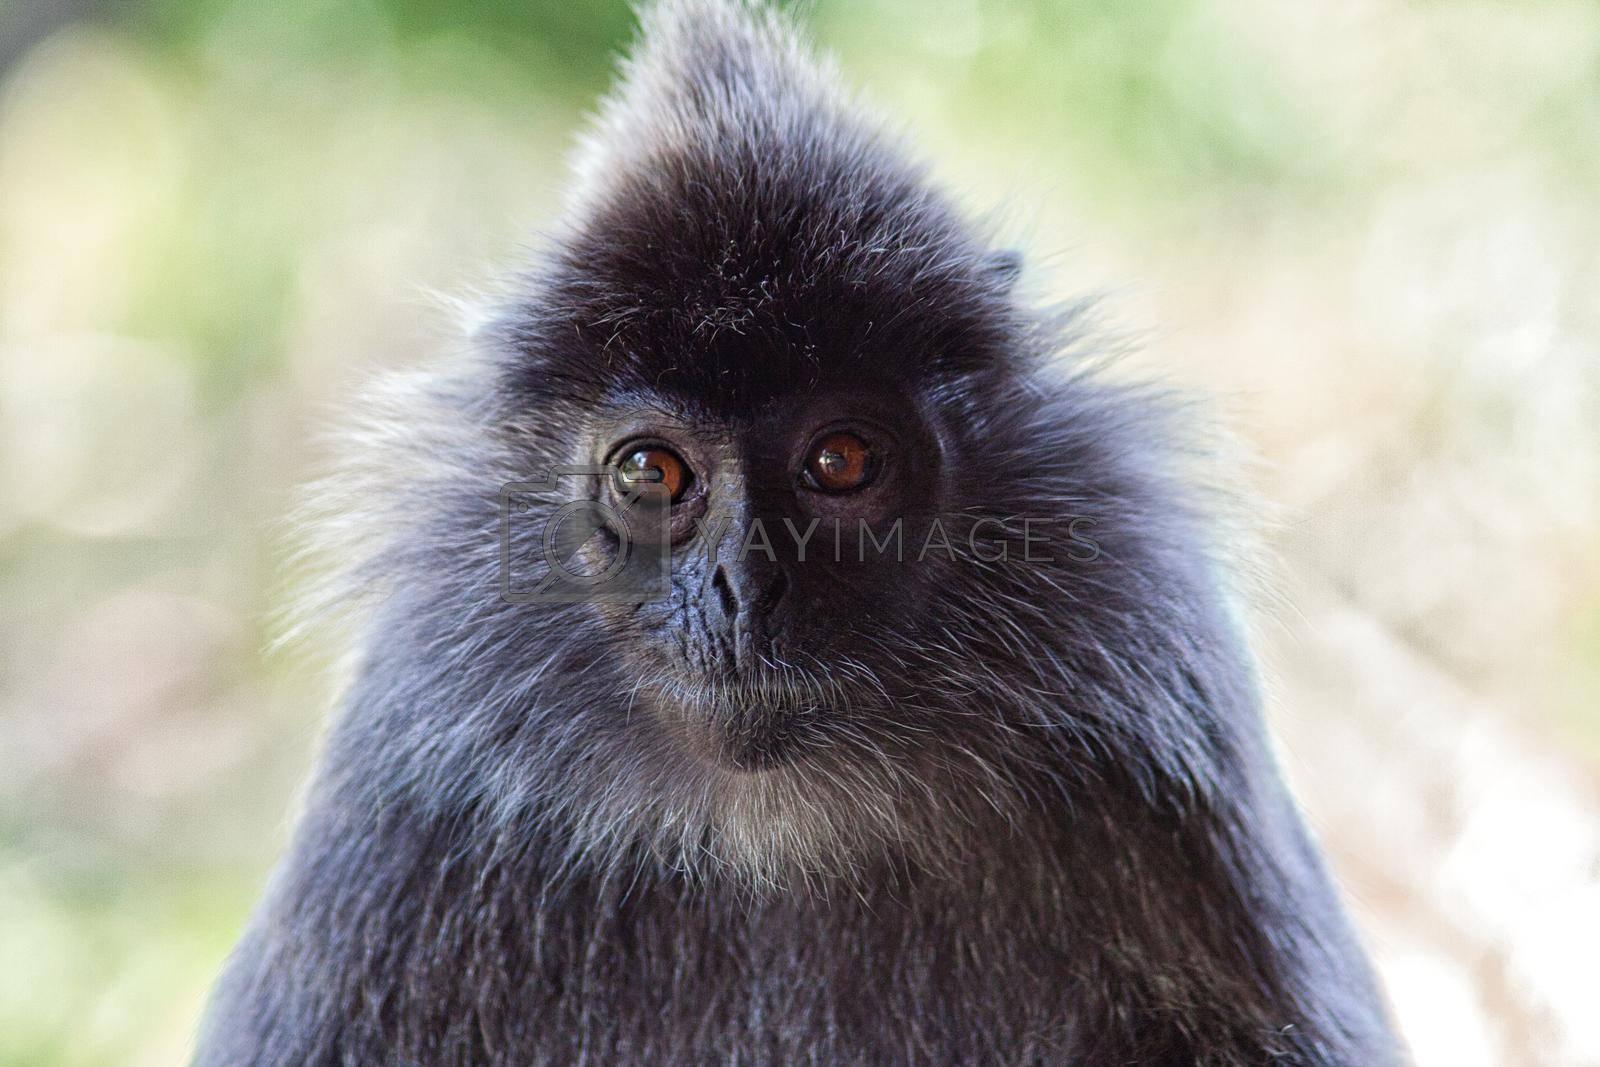 Black and white Surili monkey (Presbytis) - photographed in Borneo near Sandakan